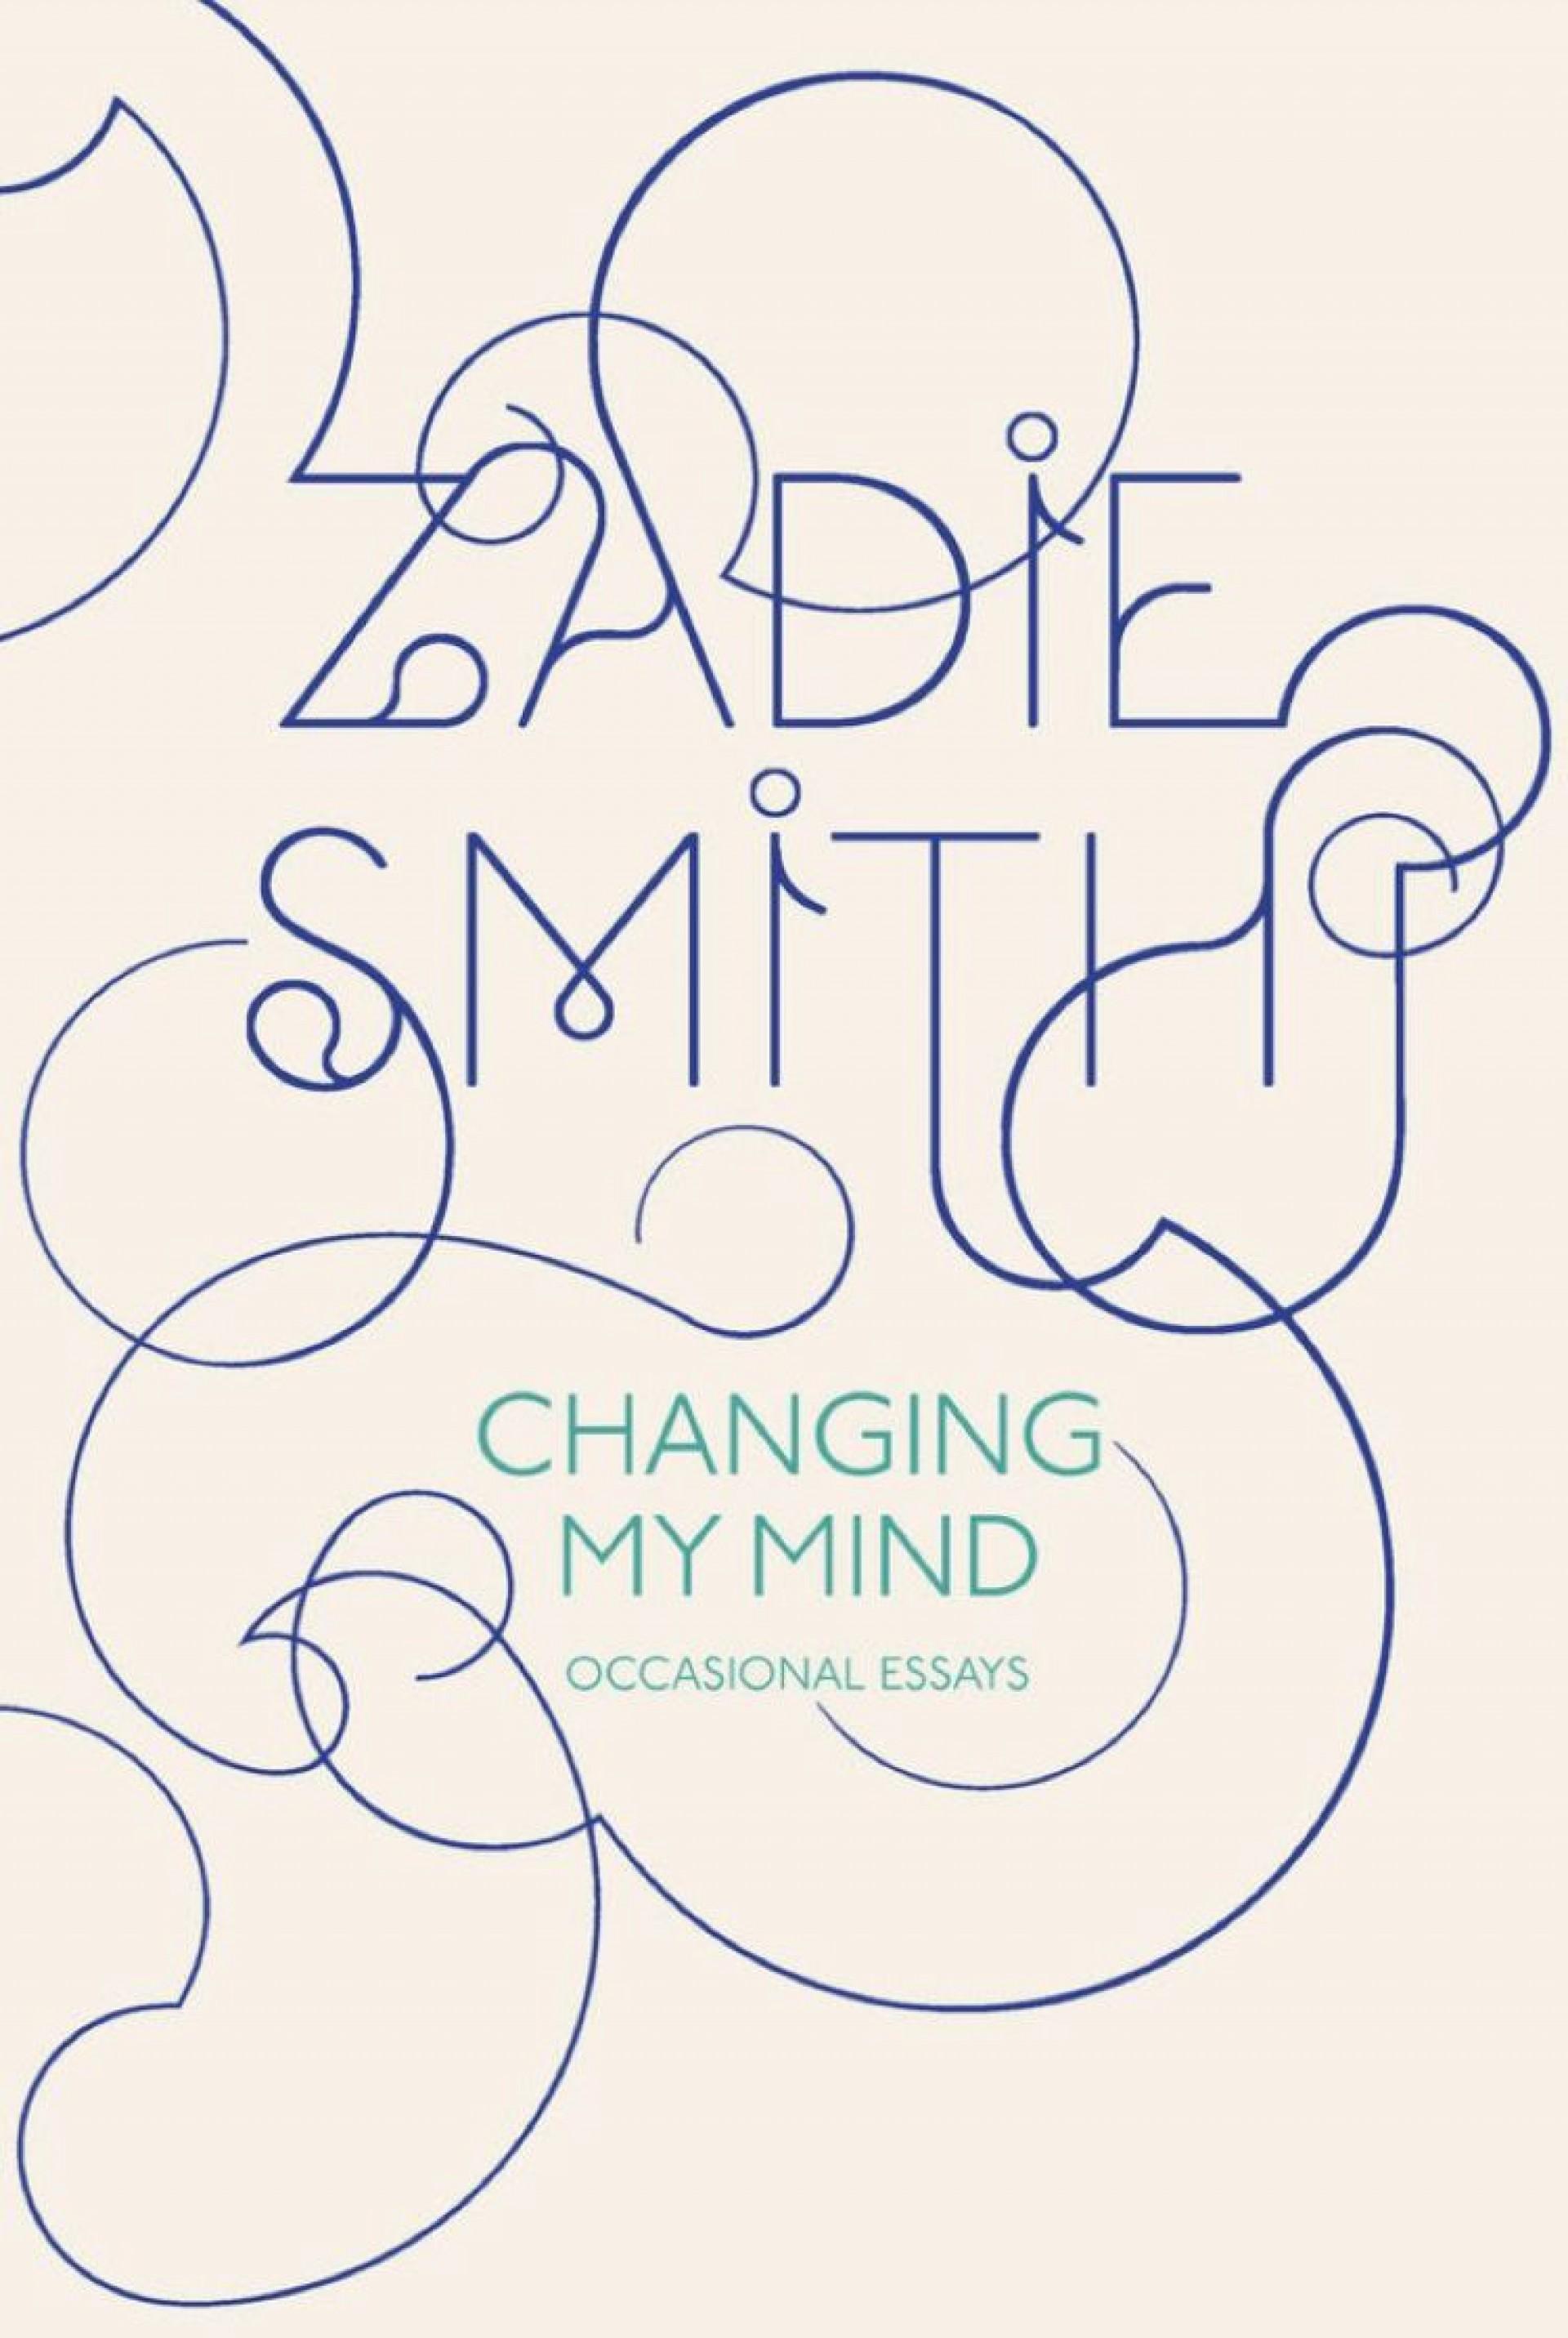 004 Essay Example Changing My Mind Occasional Essays Striking Pdf By Zadie Smith 1920